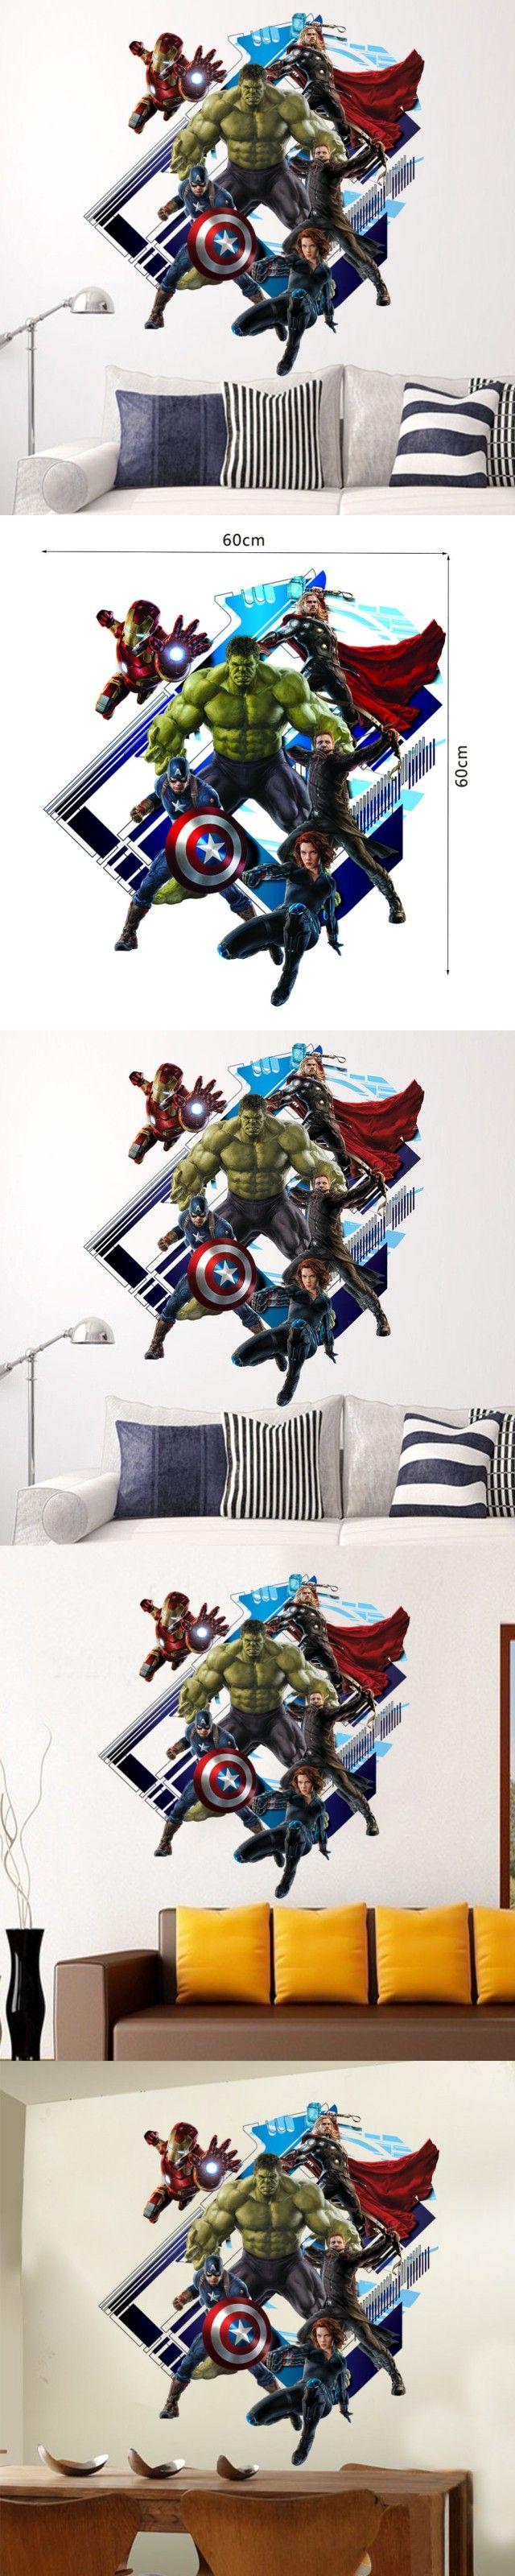 *%Y007 Super Hero Avengers Hulk Peel and Stick Wall Sticker Kids Room Stickers Cartoon Decals Home Decor Wallpaper Poster $4.19